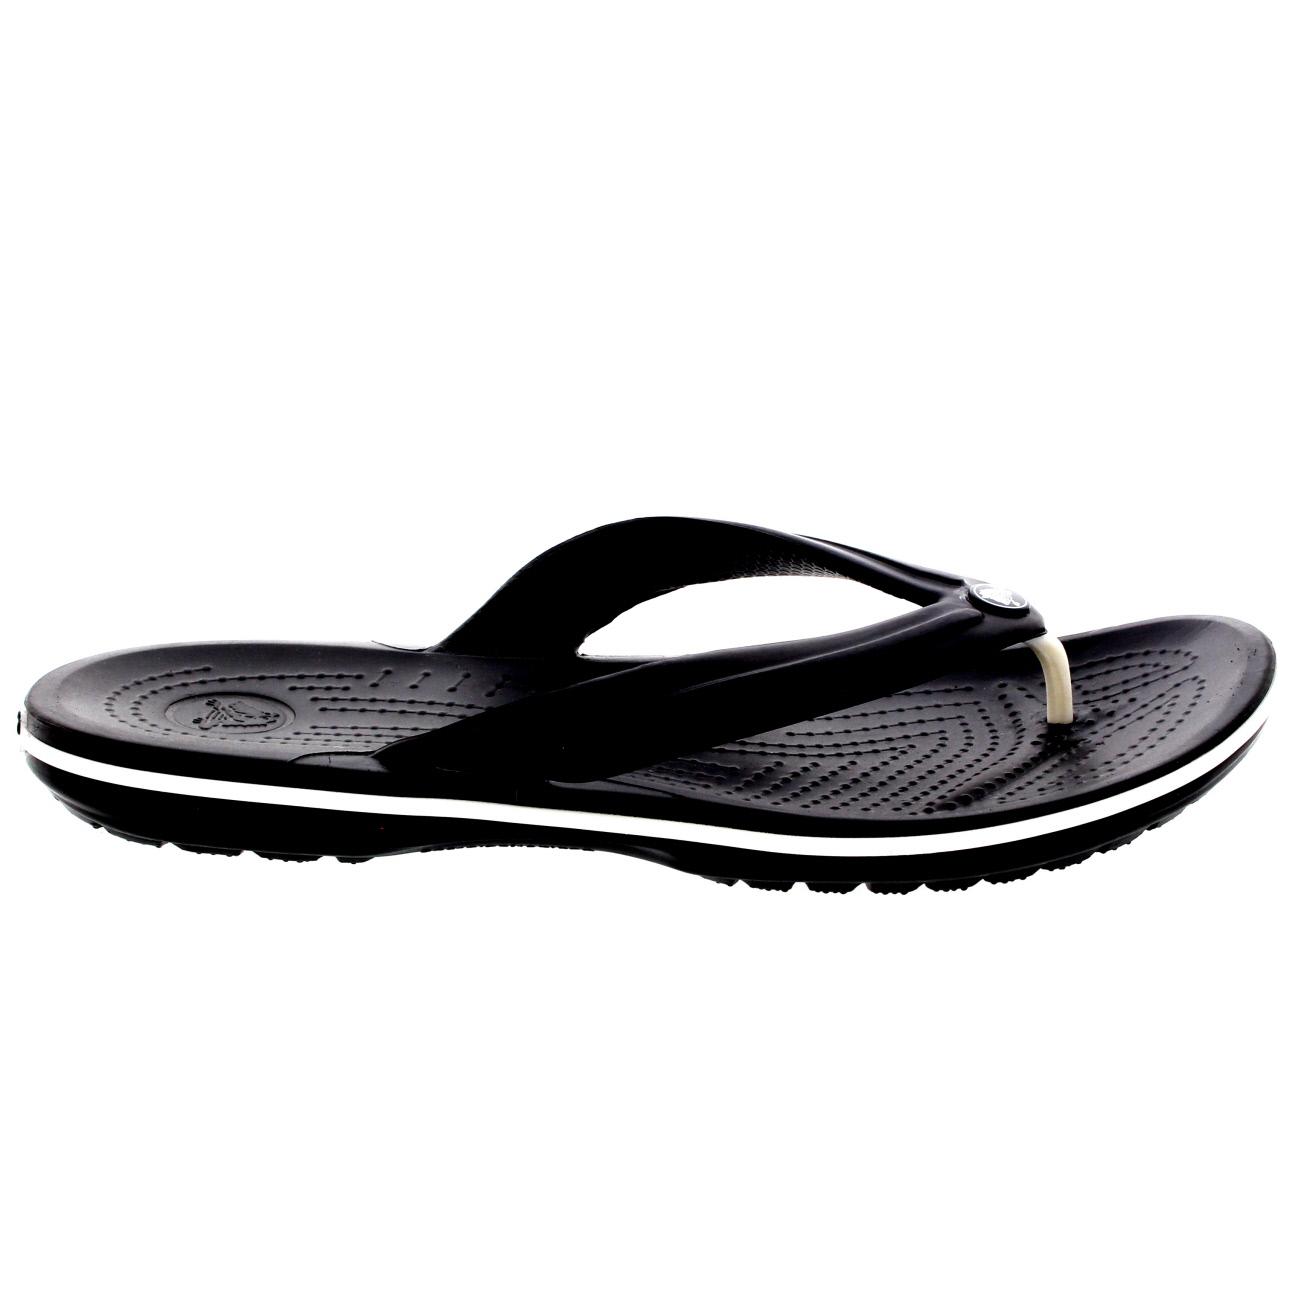 unisex womens mens crocs crocband flip holiday summer beach flip flops all sizes ebay. Black Bedroom Furniture Sets. Home Design Ideas